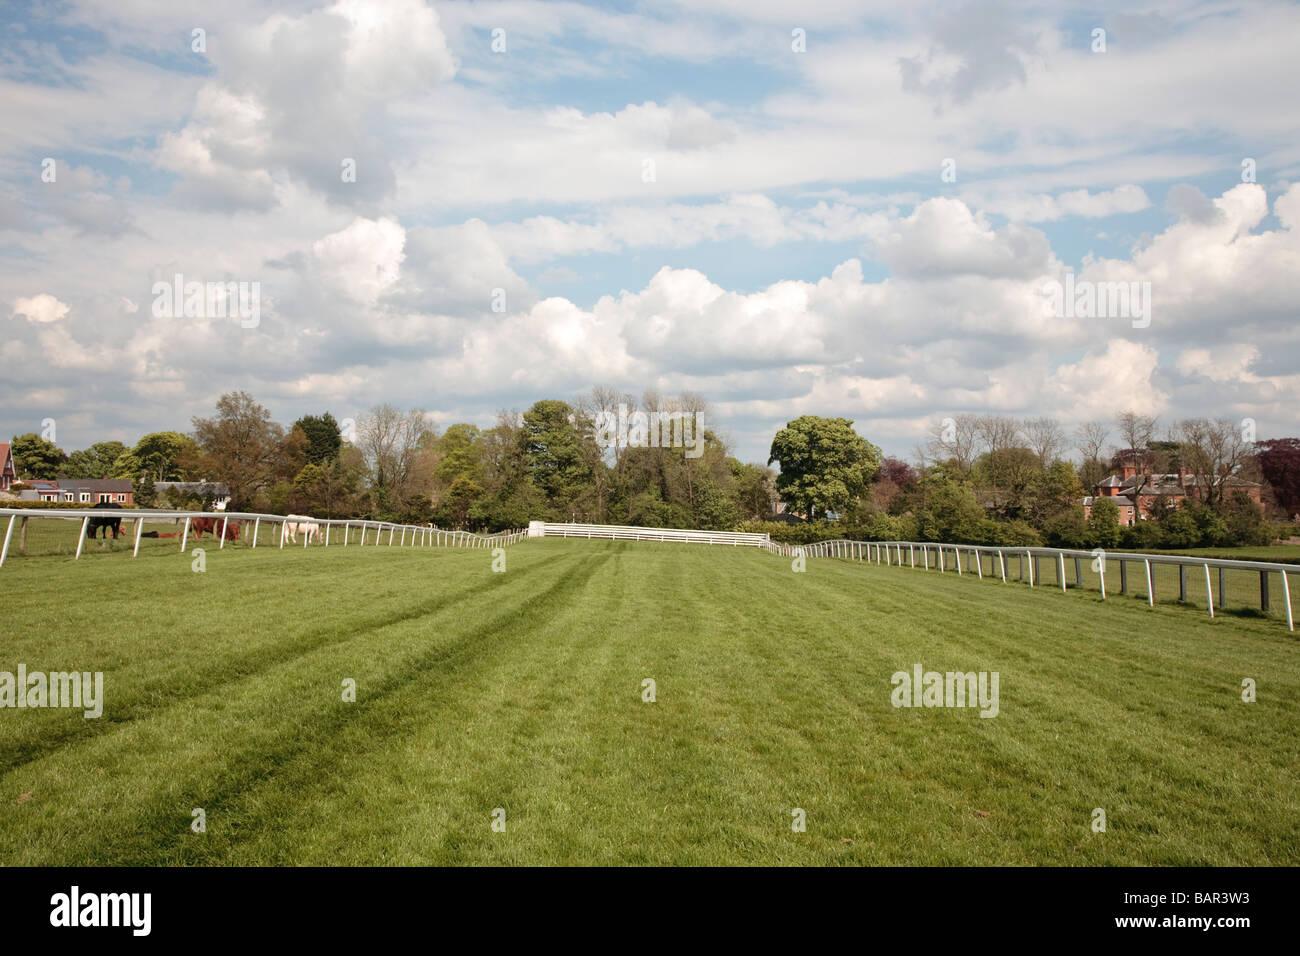 Race course Beverley Westwood, Beverley, East Yorkshire, England, UK - Stock Image